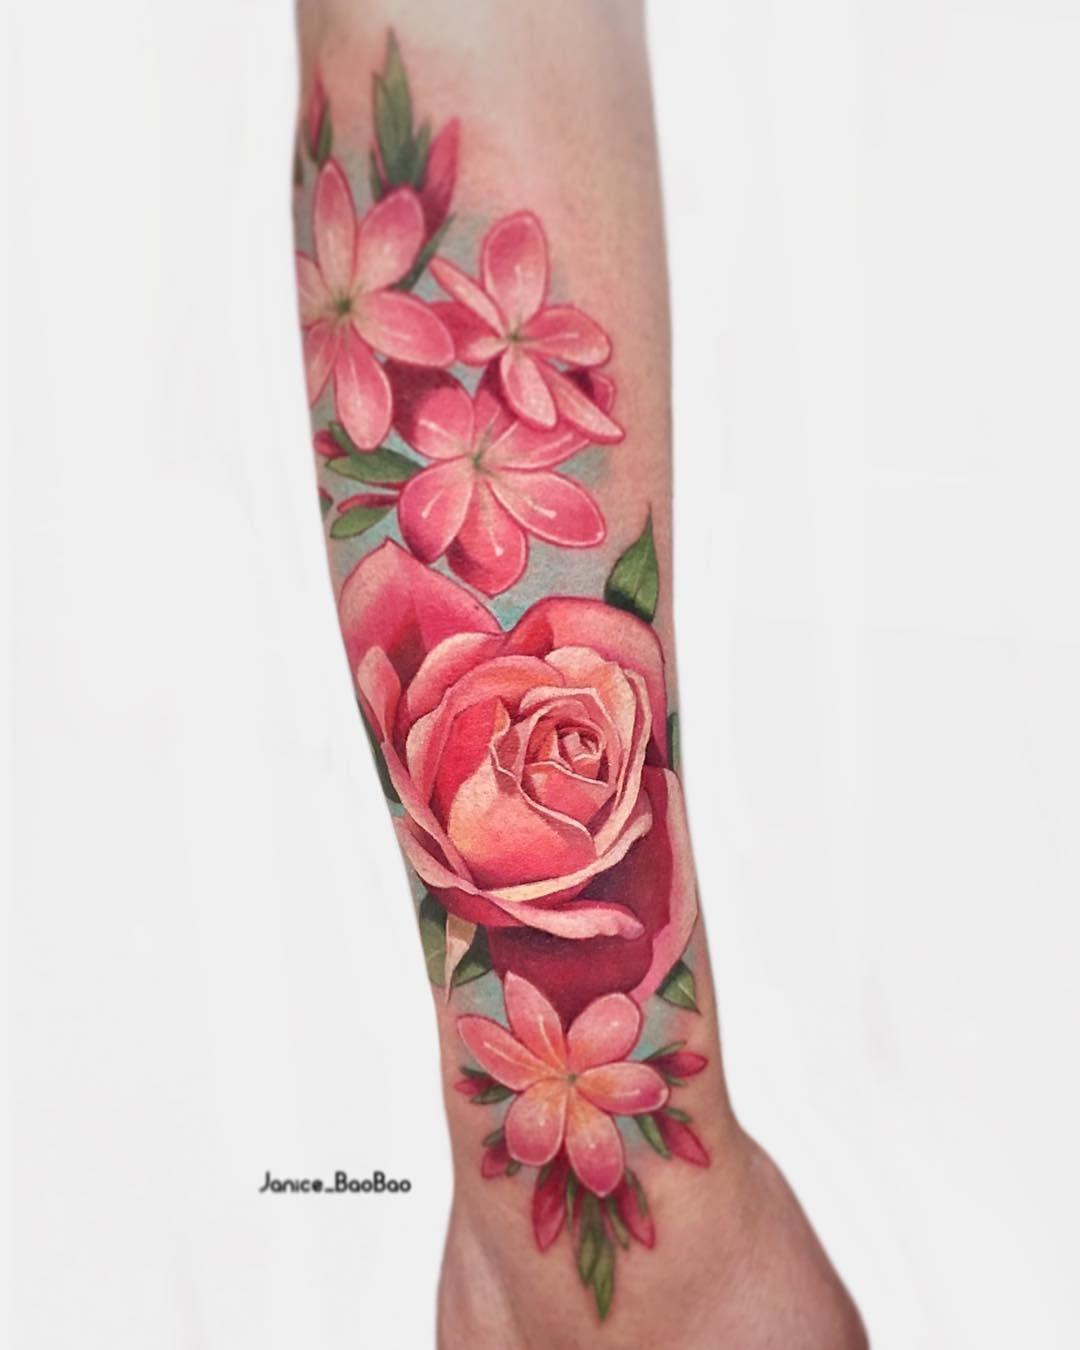 Tattoo artist Janice Bao Bao color authors style illustrative neo ...